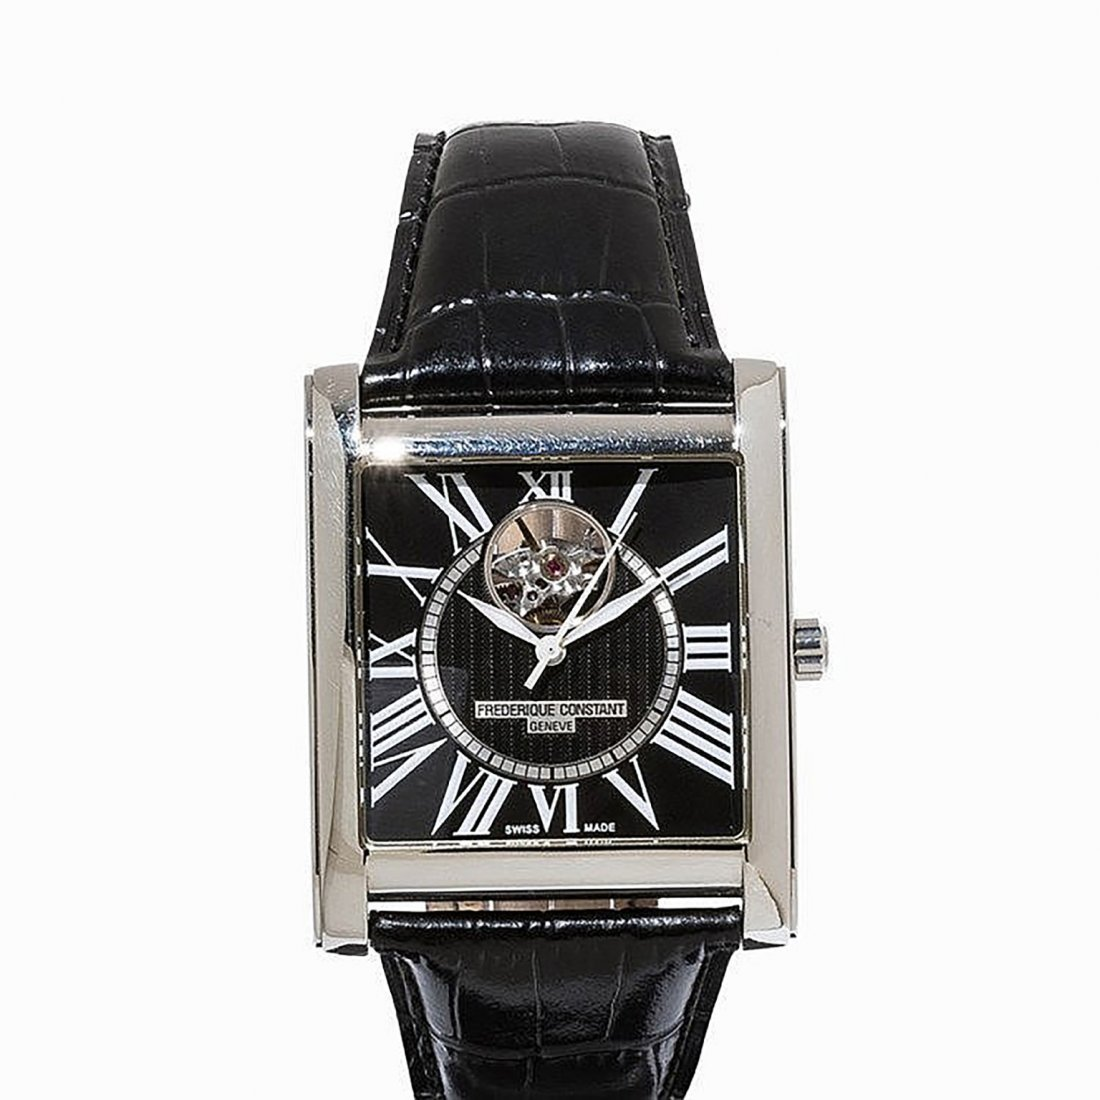 Frederique Constant Automatic Wristwatch, Switerland